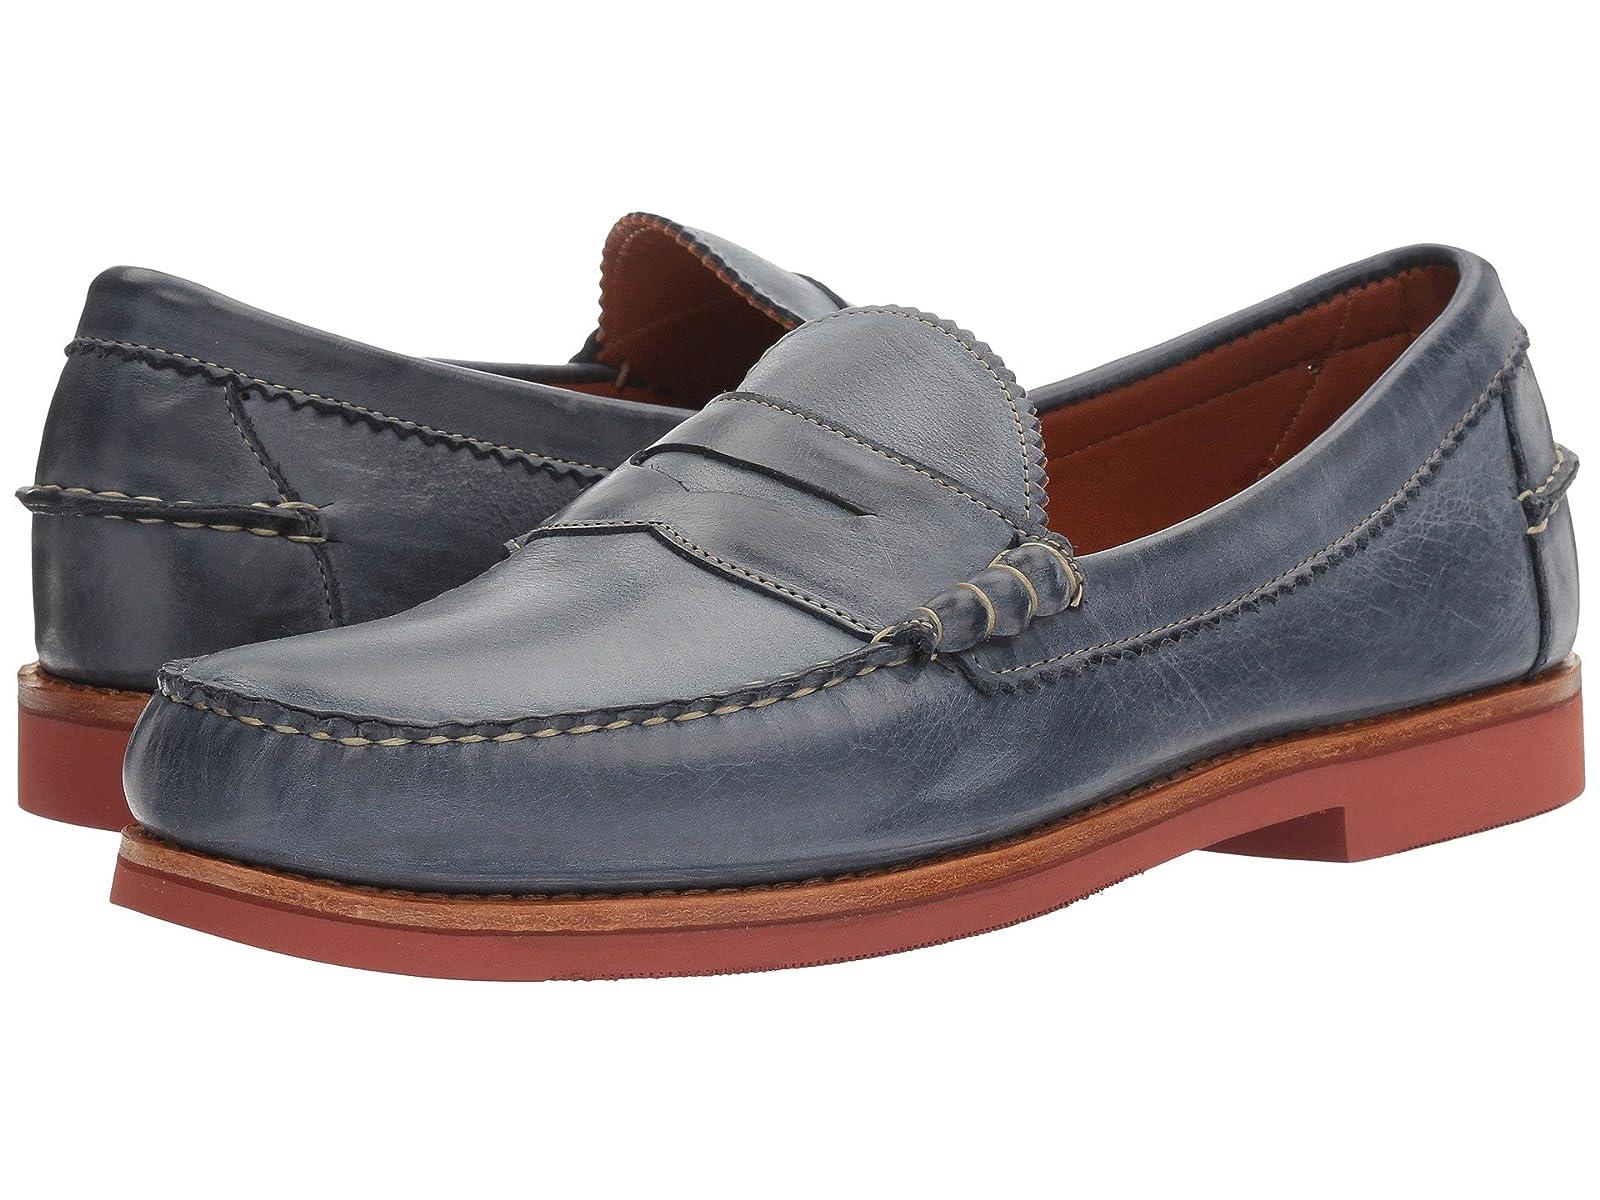 Allen Edmonds SedonaCheap and distinctive eye-catching shoes